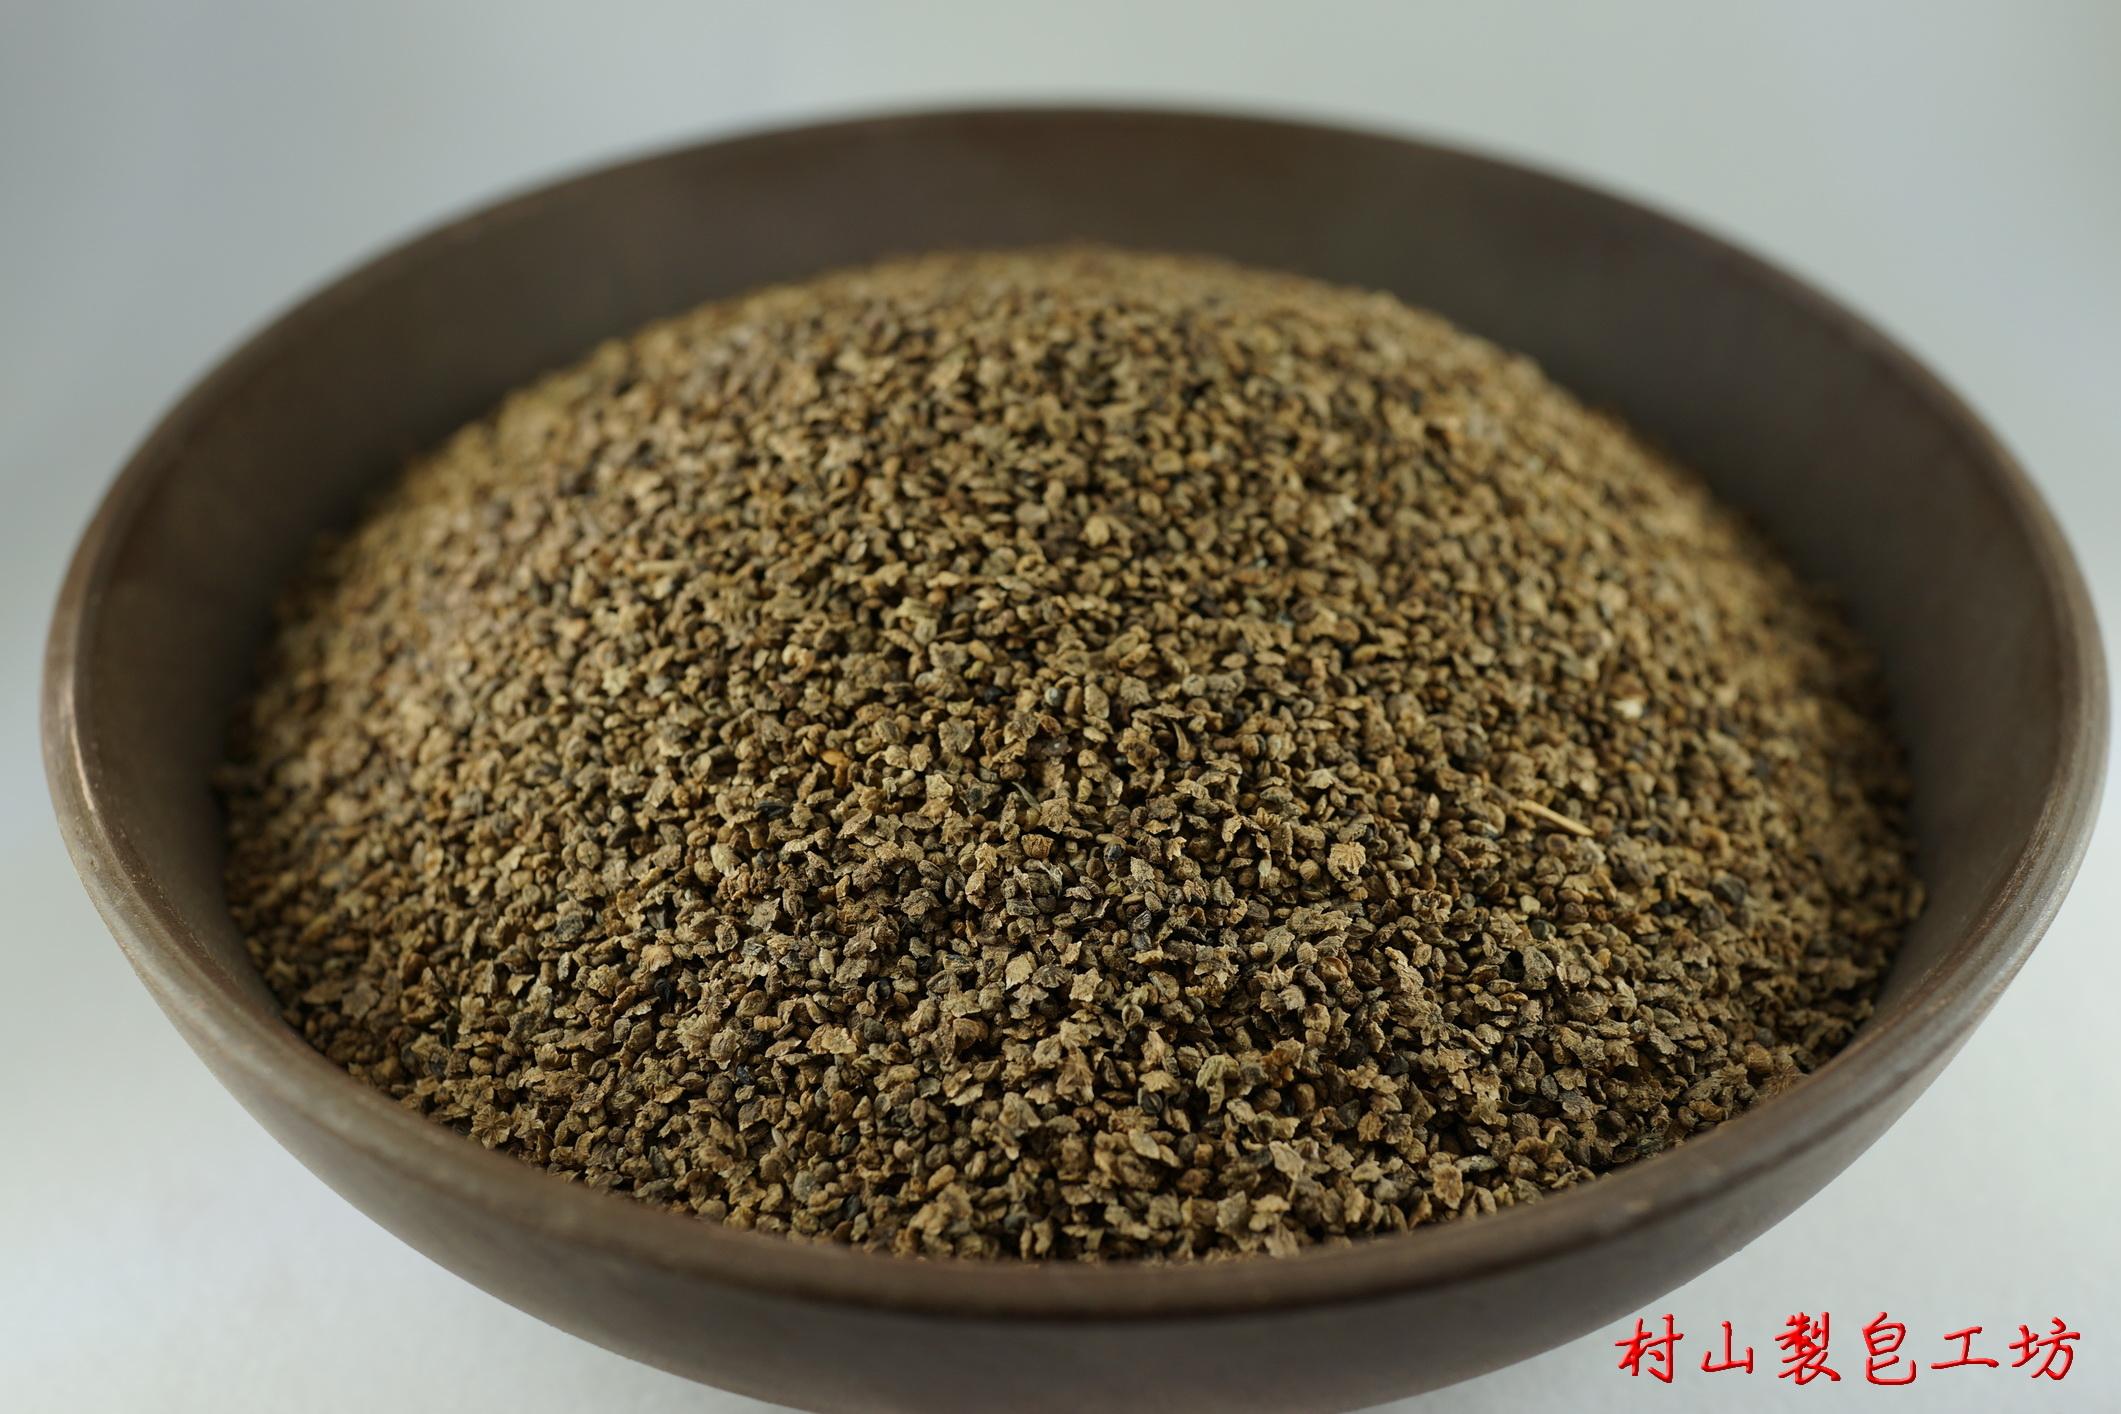 kochiae-fructus-2